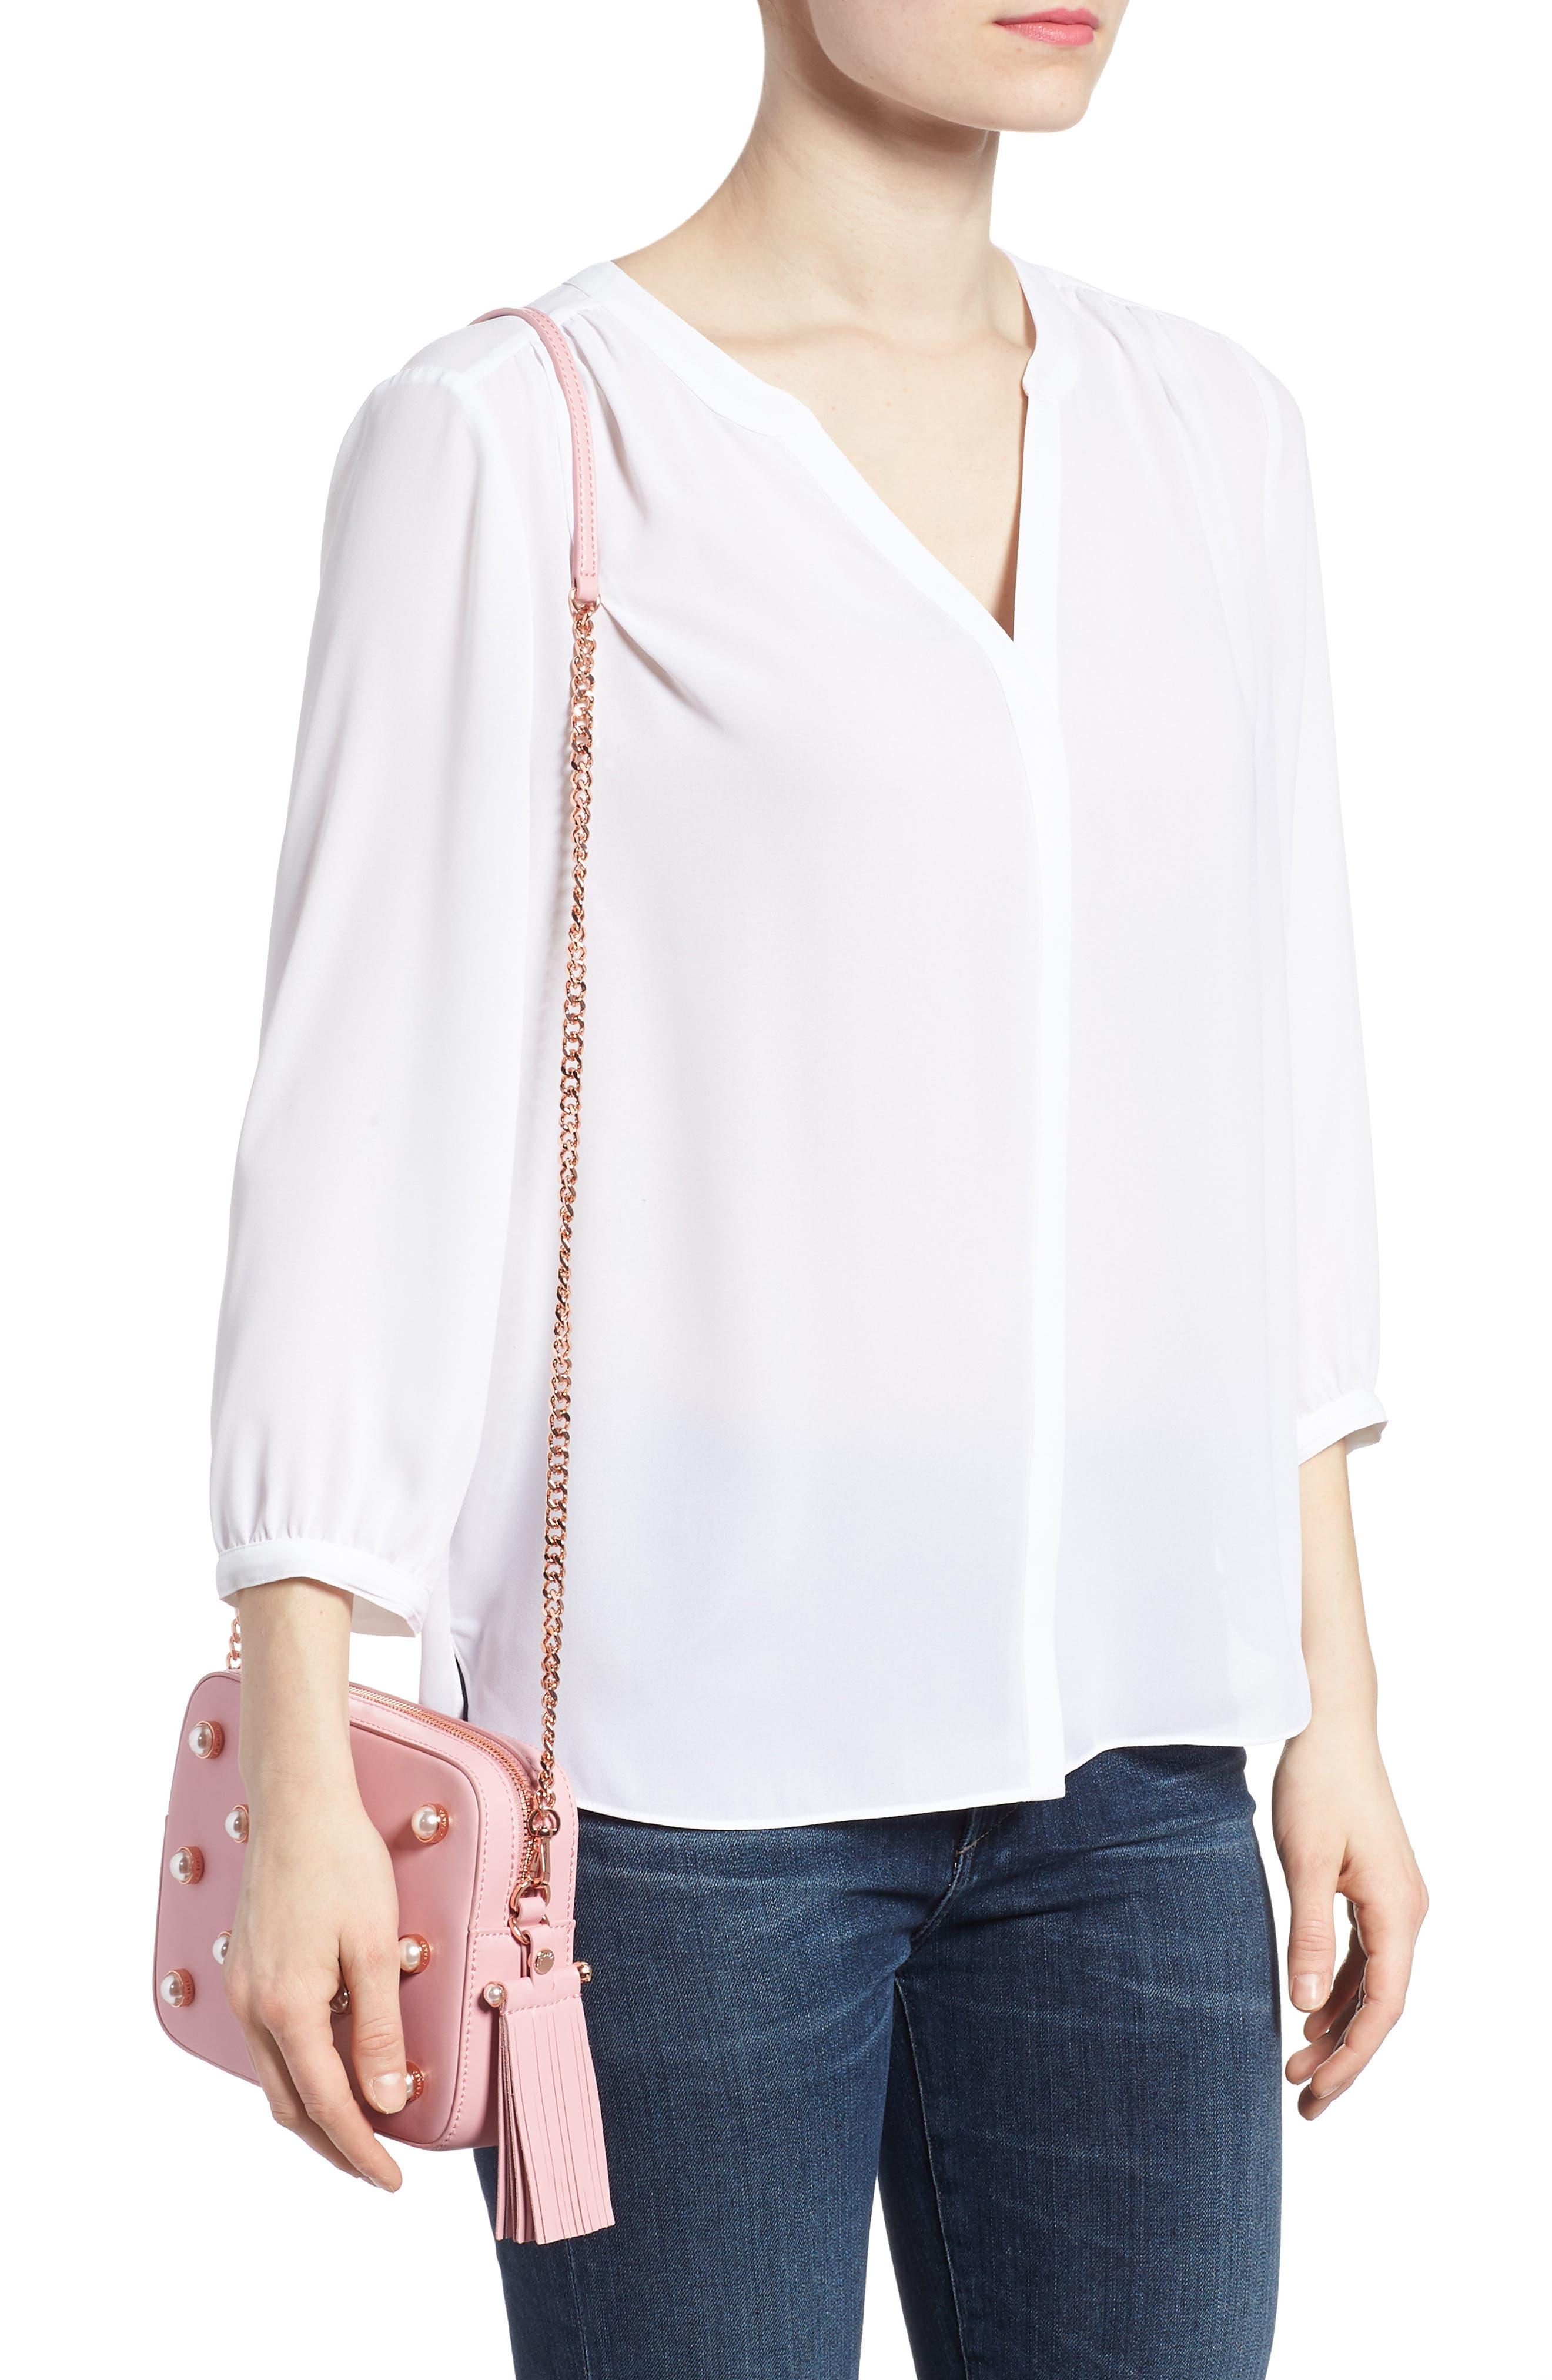 Alessia Imitation Pearl Embellished Leather Crossbody,                             Alternate thumbnail 2, color,                             Dusky Pink